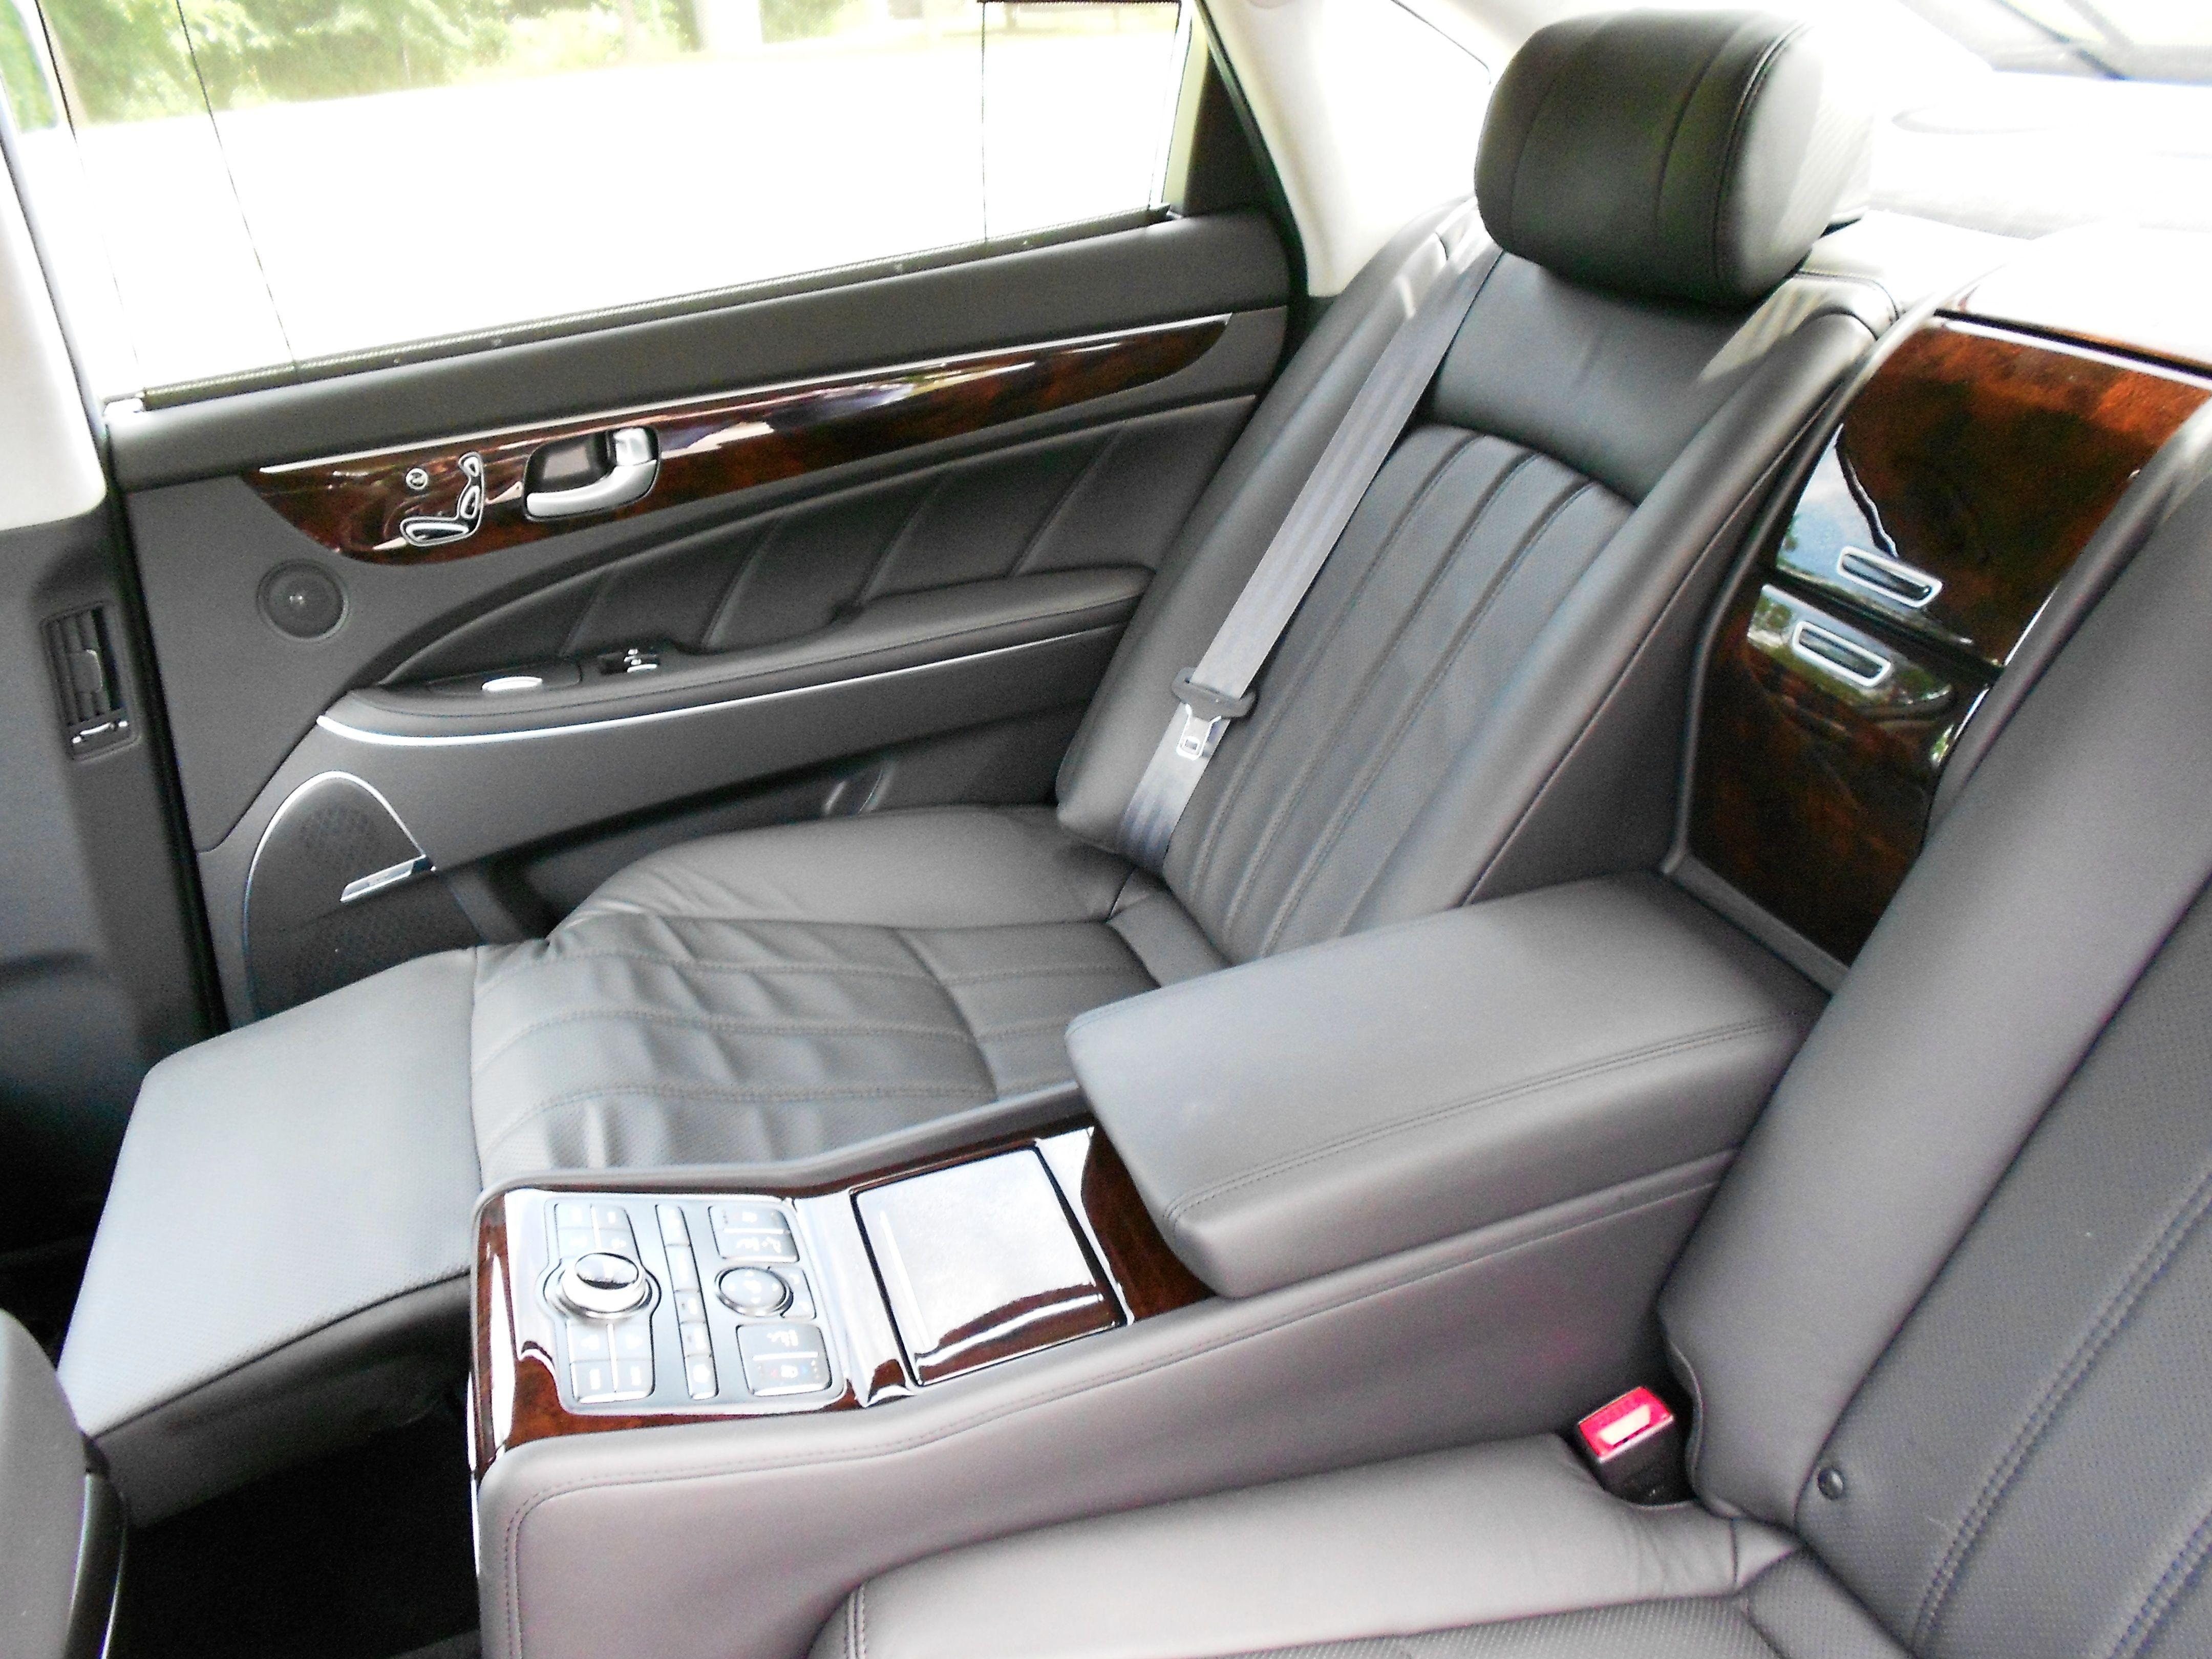 2012 hyundai equus reclining rear seat equui pinterest rear seat dream cars and cars. Black Bedroom Furniture Sets. Home Design Ideas